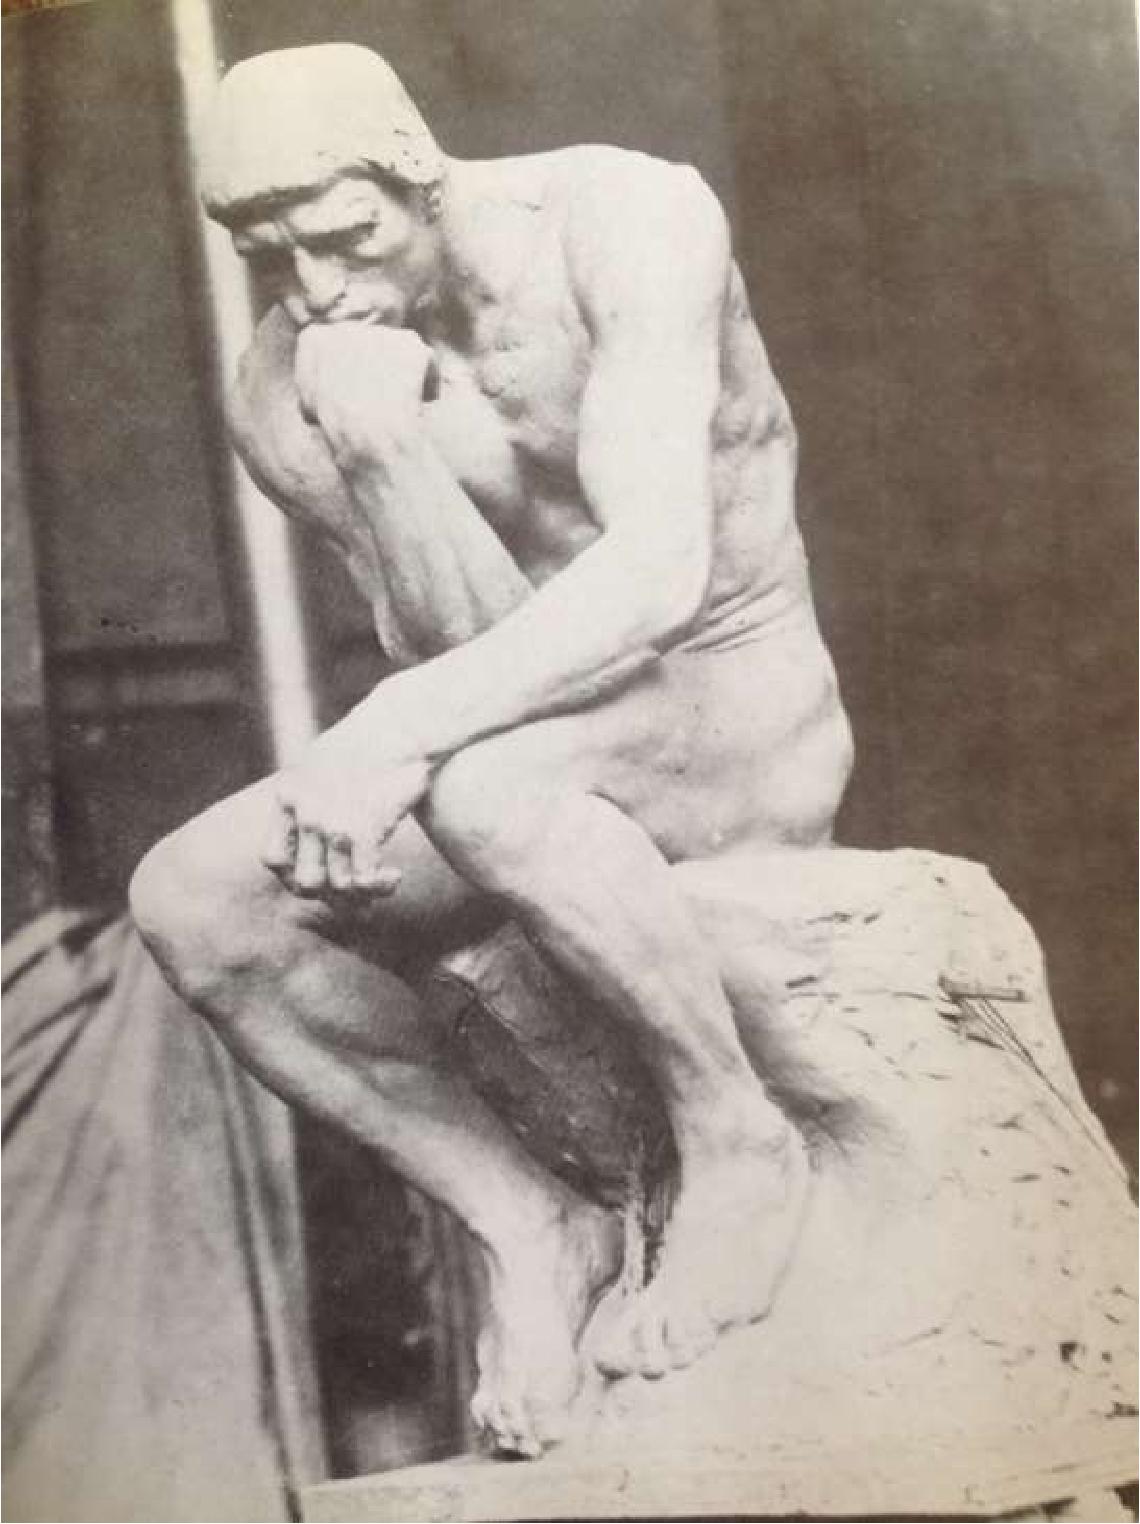 figure 2.78